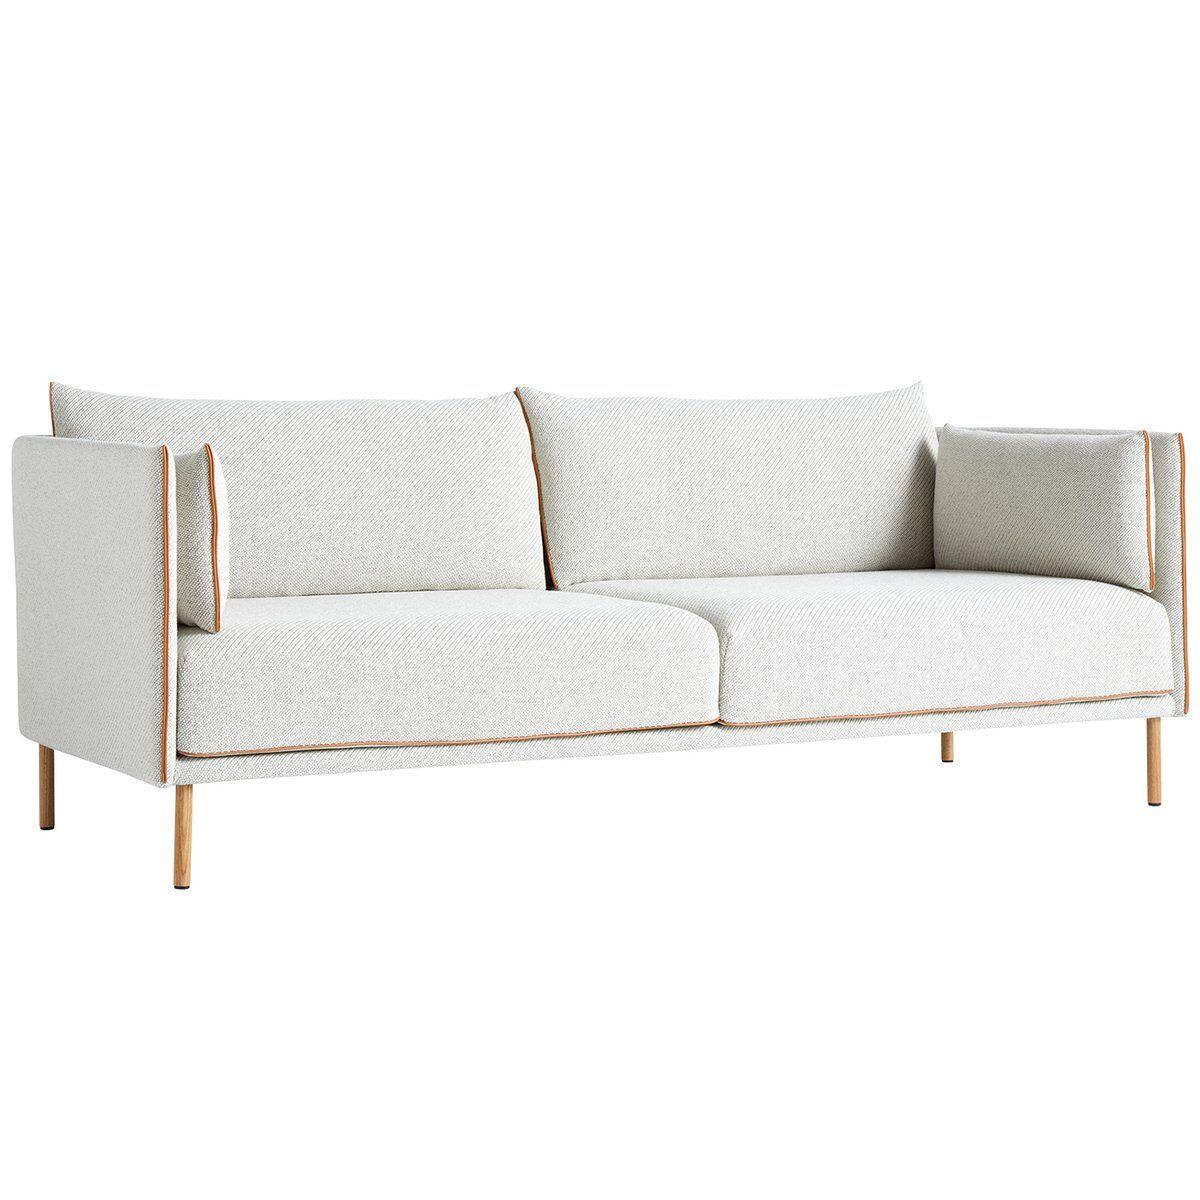 Image of Hay Silhouette sohva 3-ist, Coda 100/Silk cognac - öljytty tammi